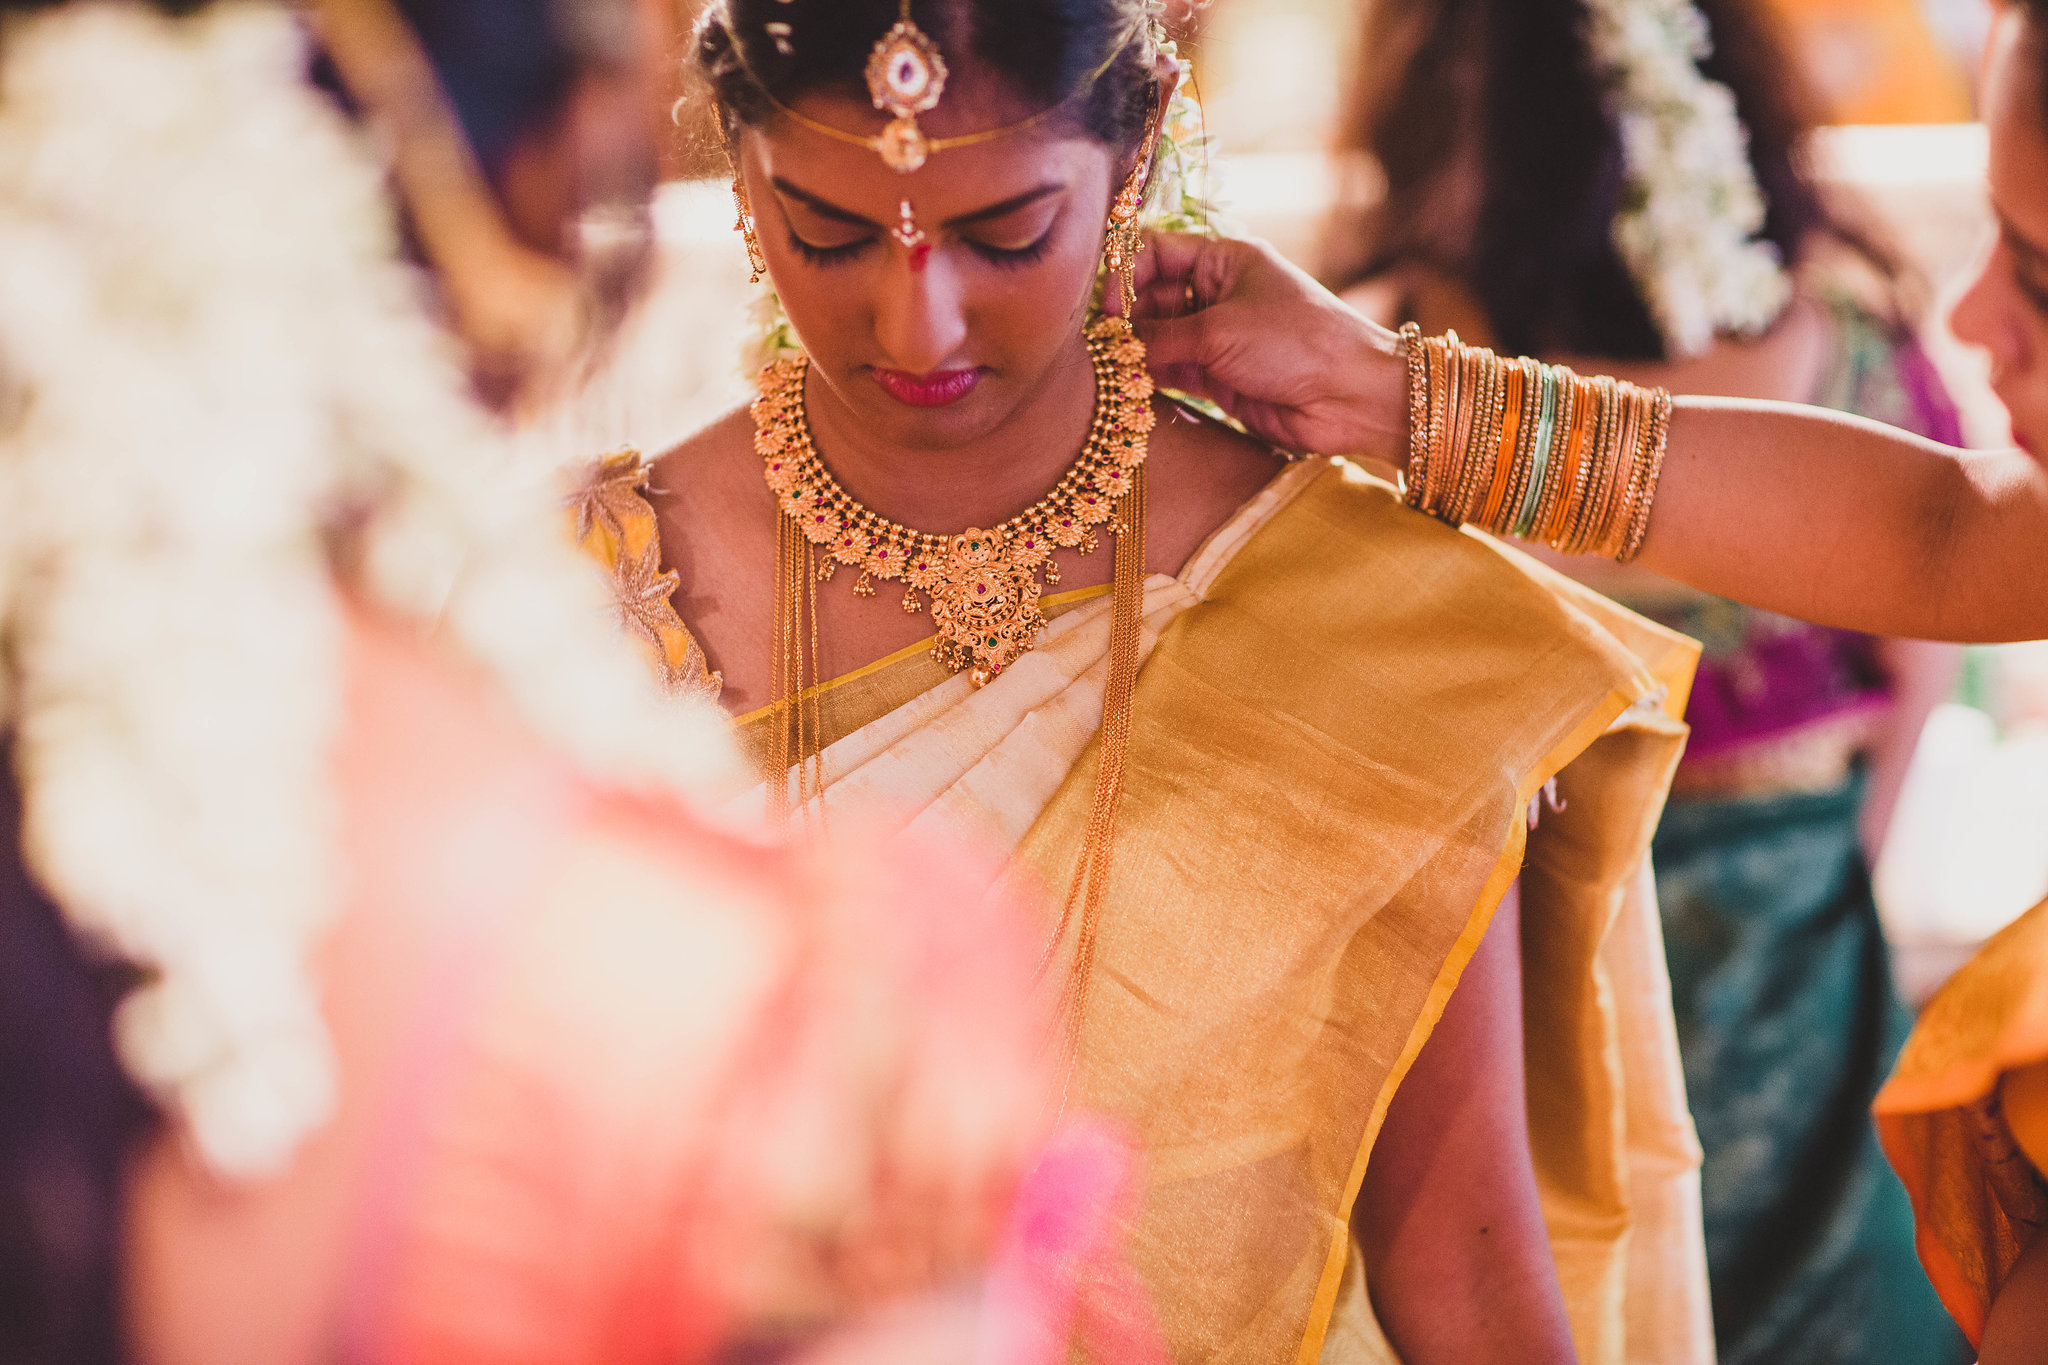 kingston-house-weddings-and-events-wedding-backayard-by-seattle-wedding-photographer-adina-preston-5.jpg